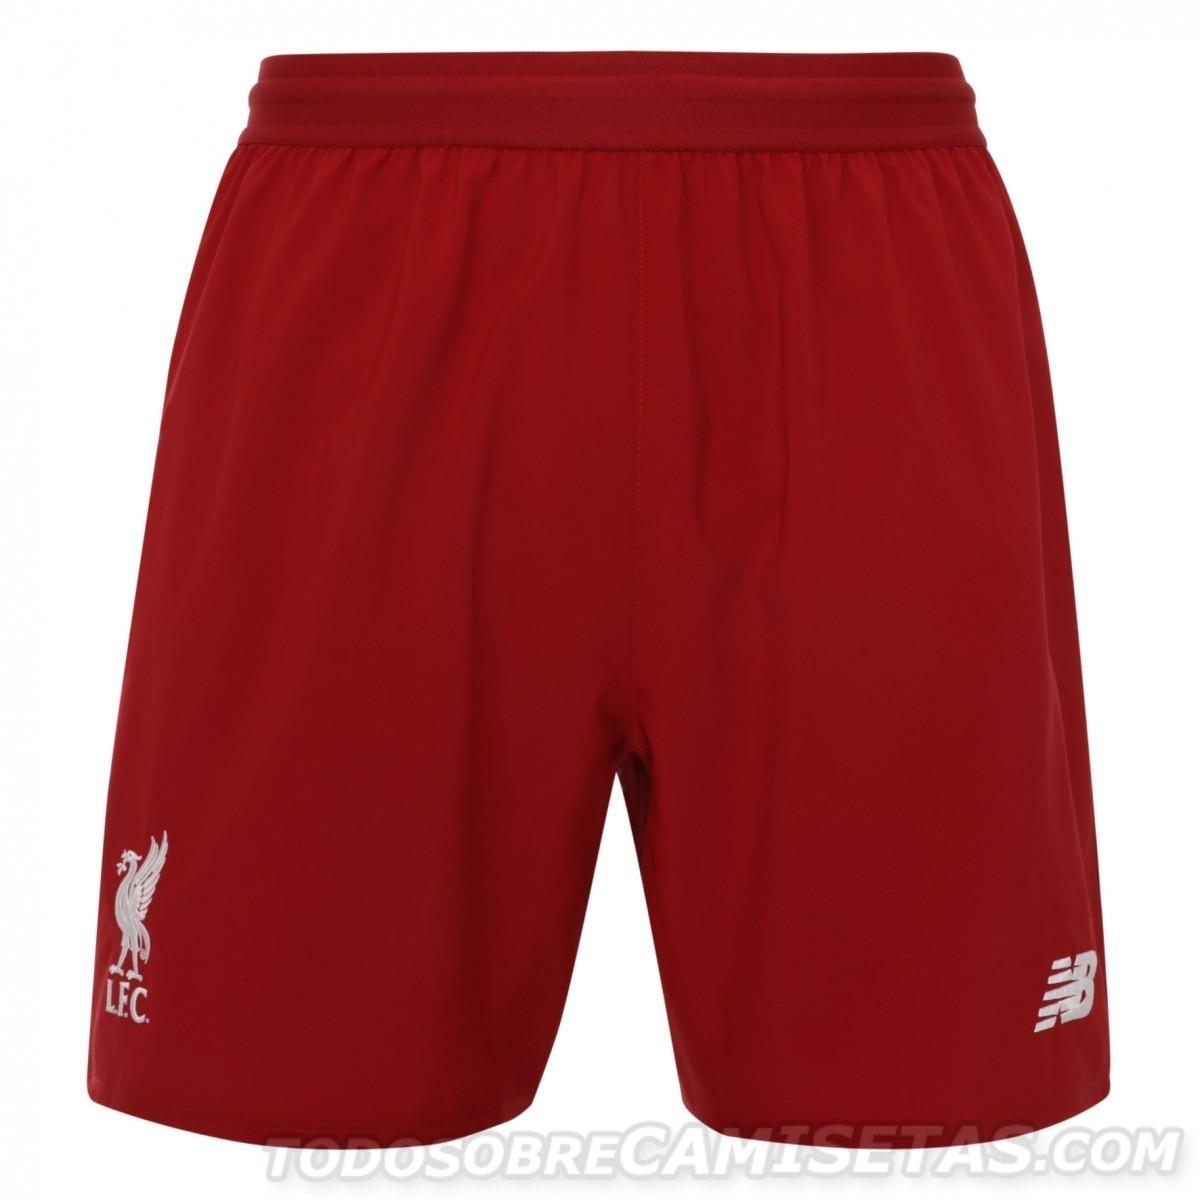 Liverpool-2018-19-New-NEW-BALANCE-home-kit-8.jpg